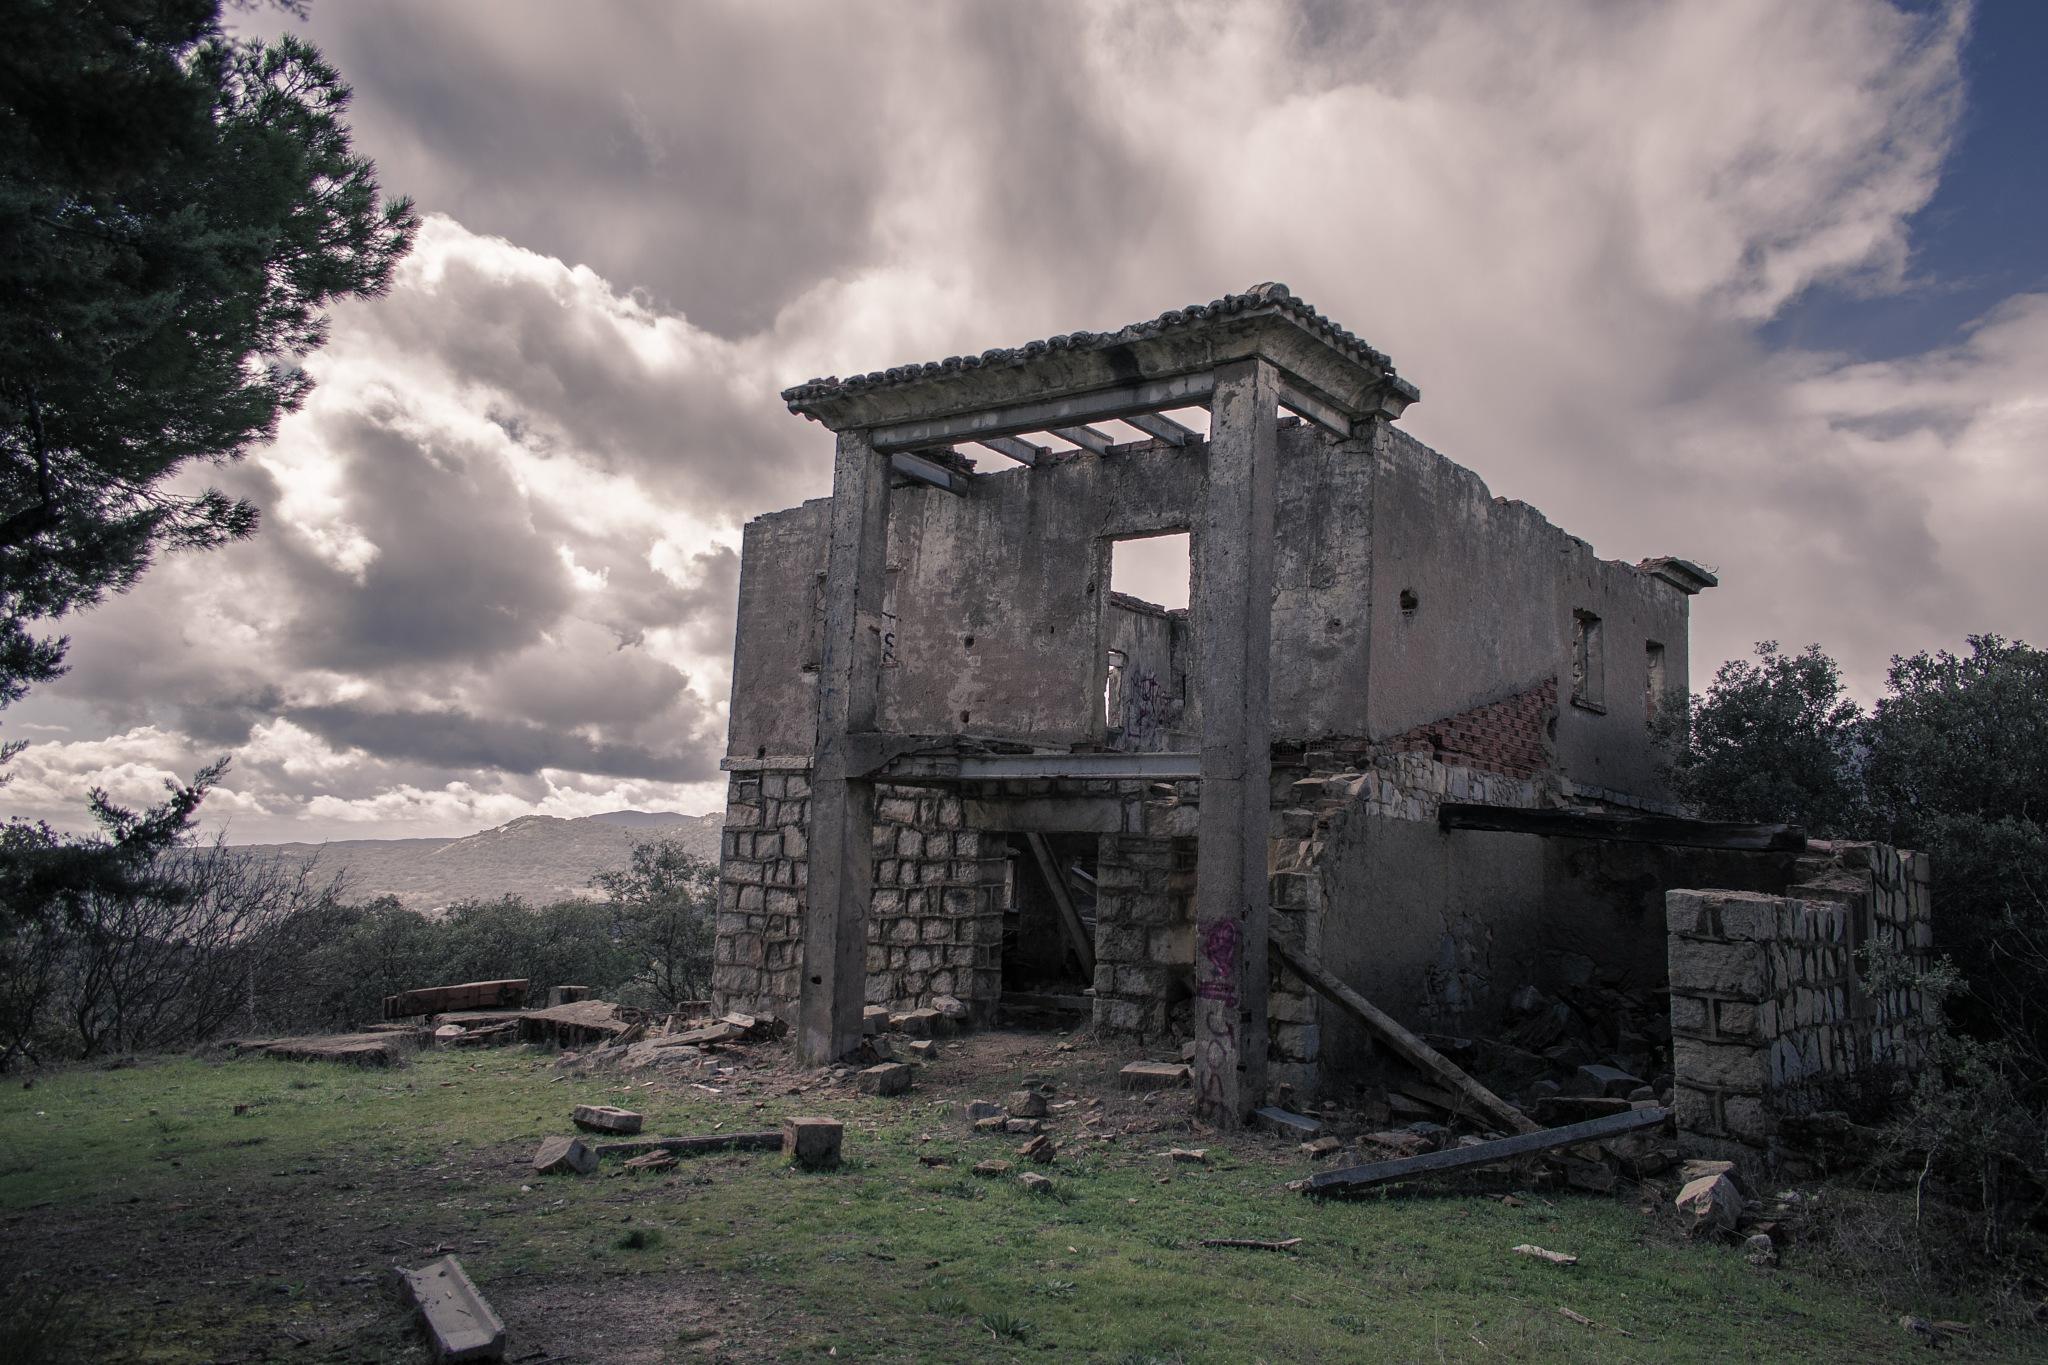 Abandoned dreams by Pablo Albu